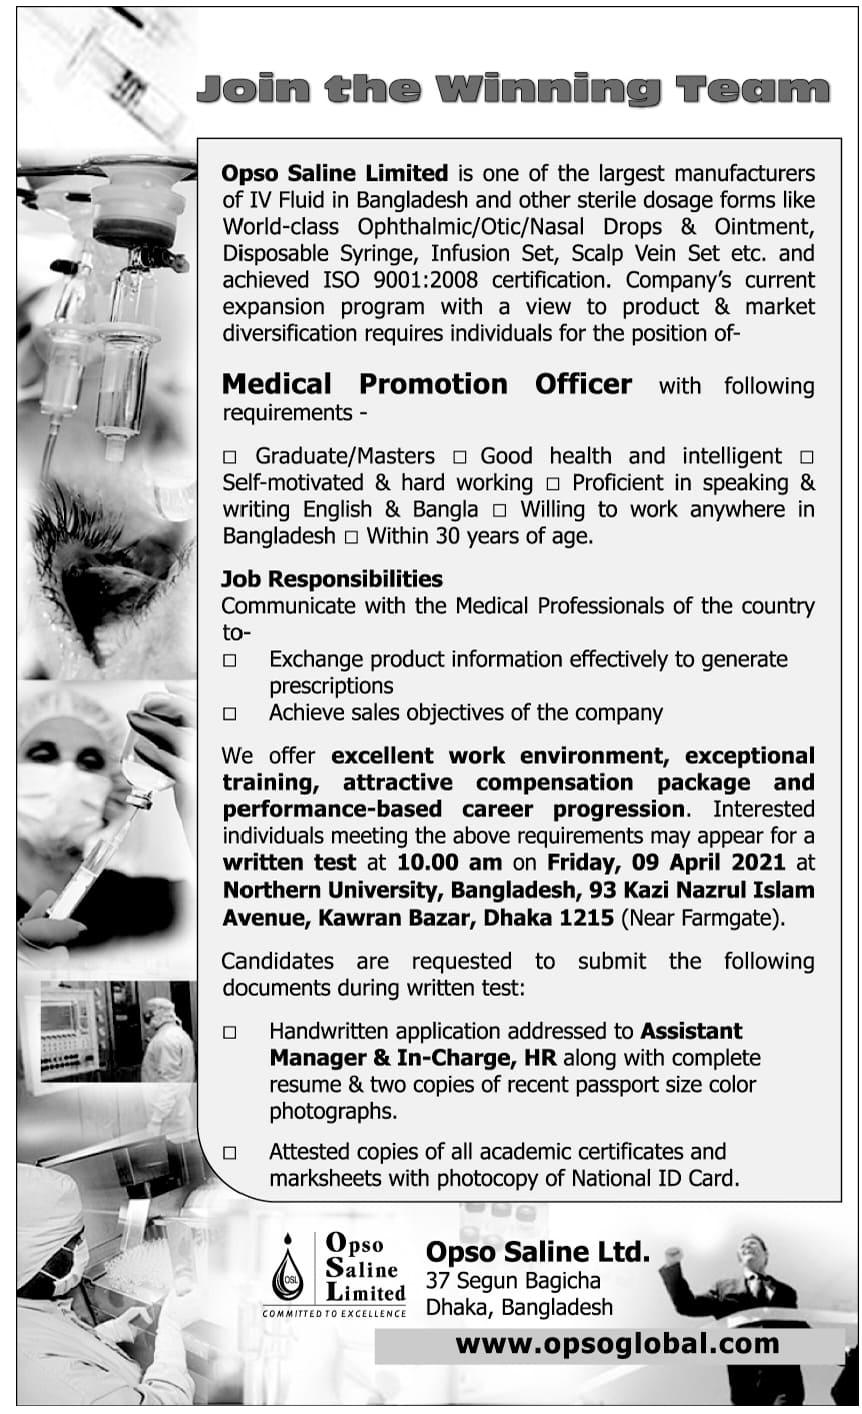 Opso Saline Limited Job Circular 2021